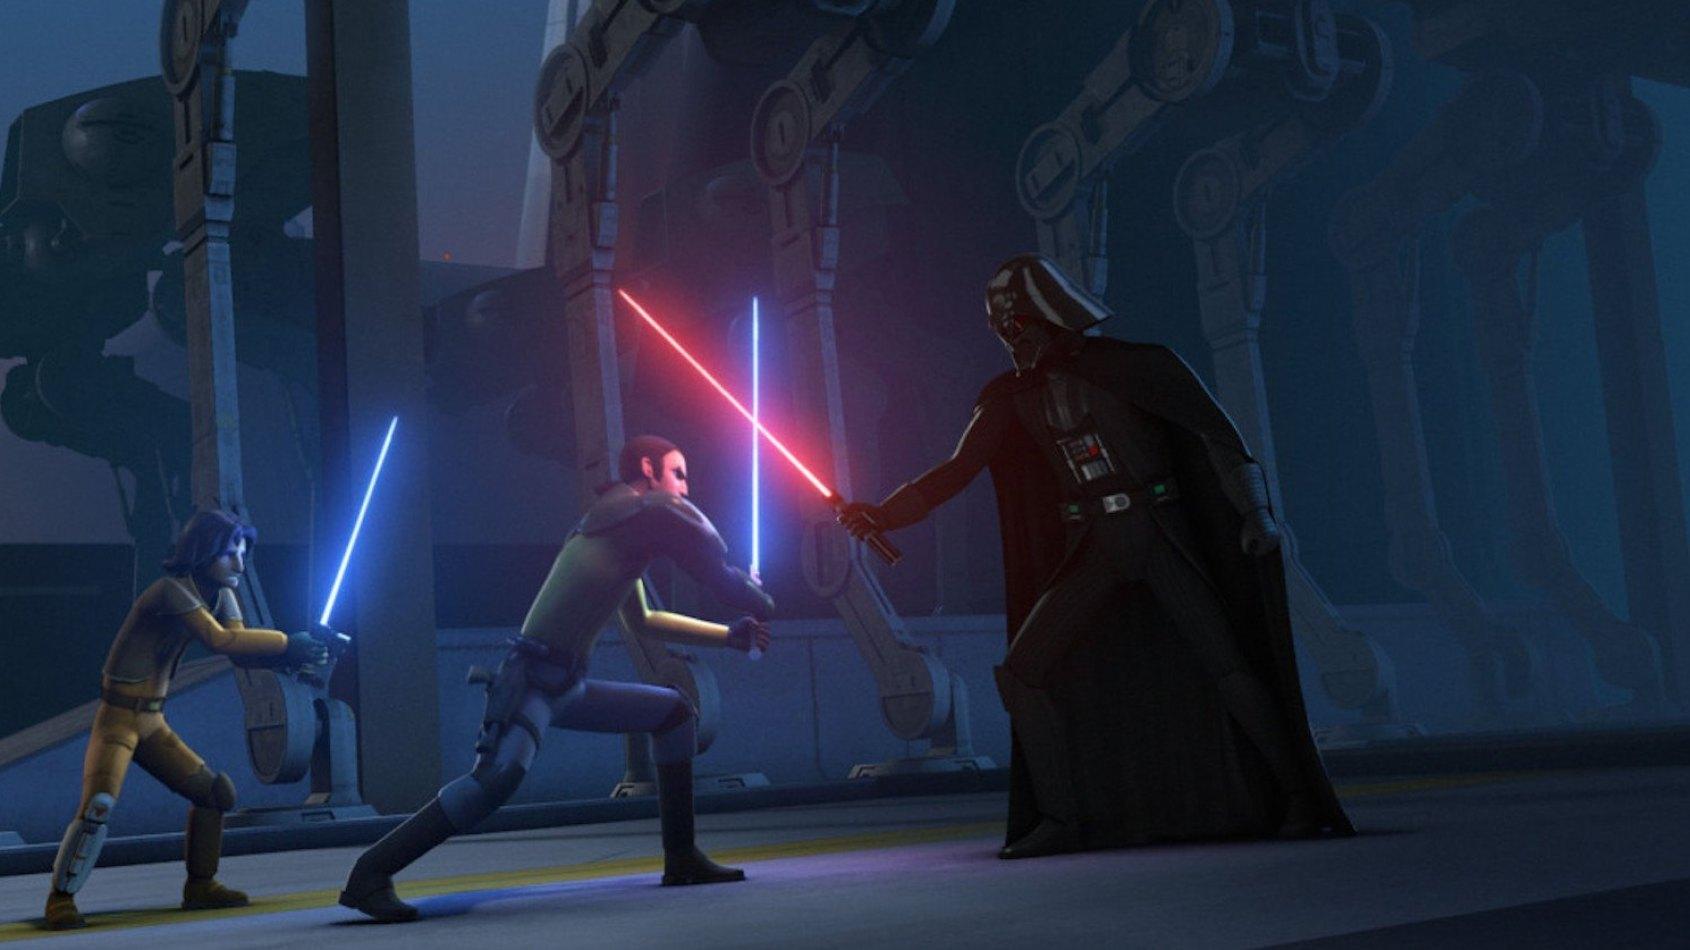 Comment la trilogie originale a inspir� Star Wars Rebels